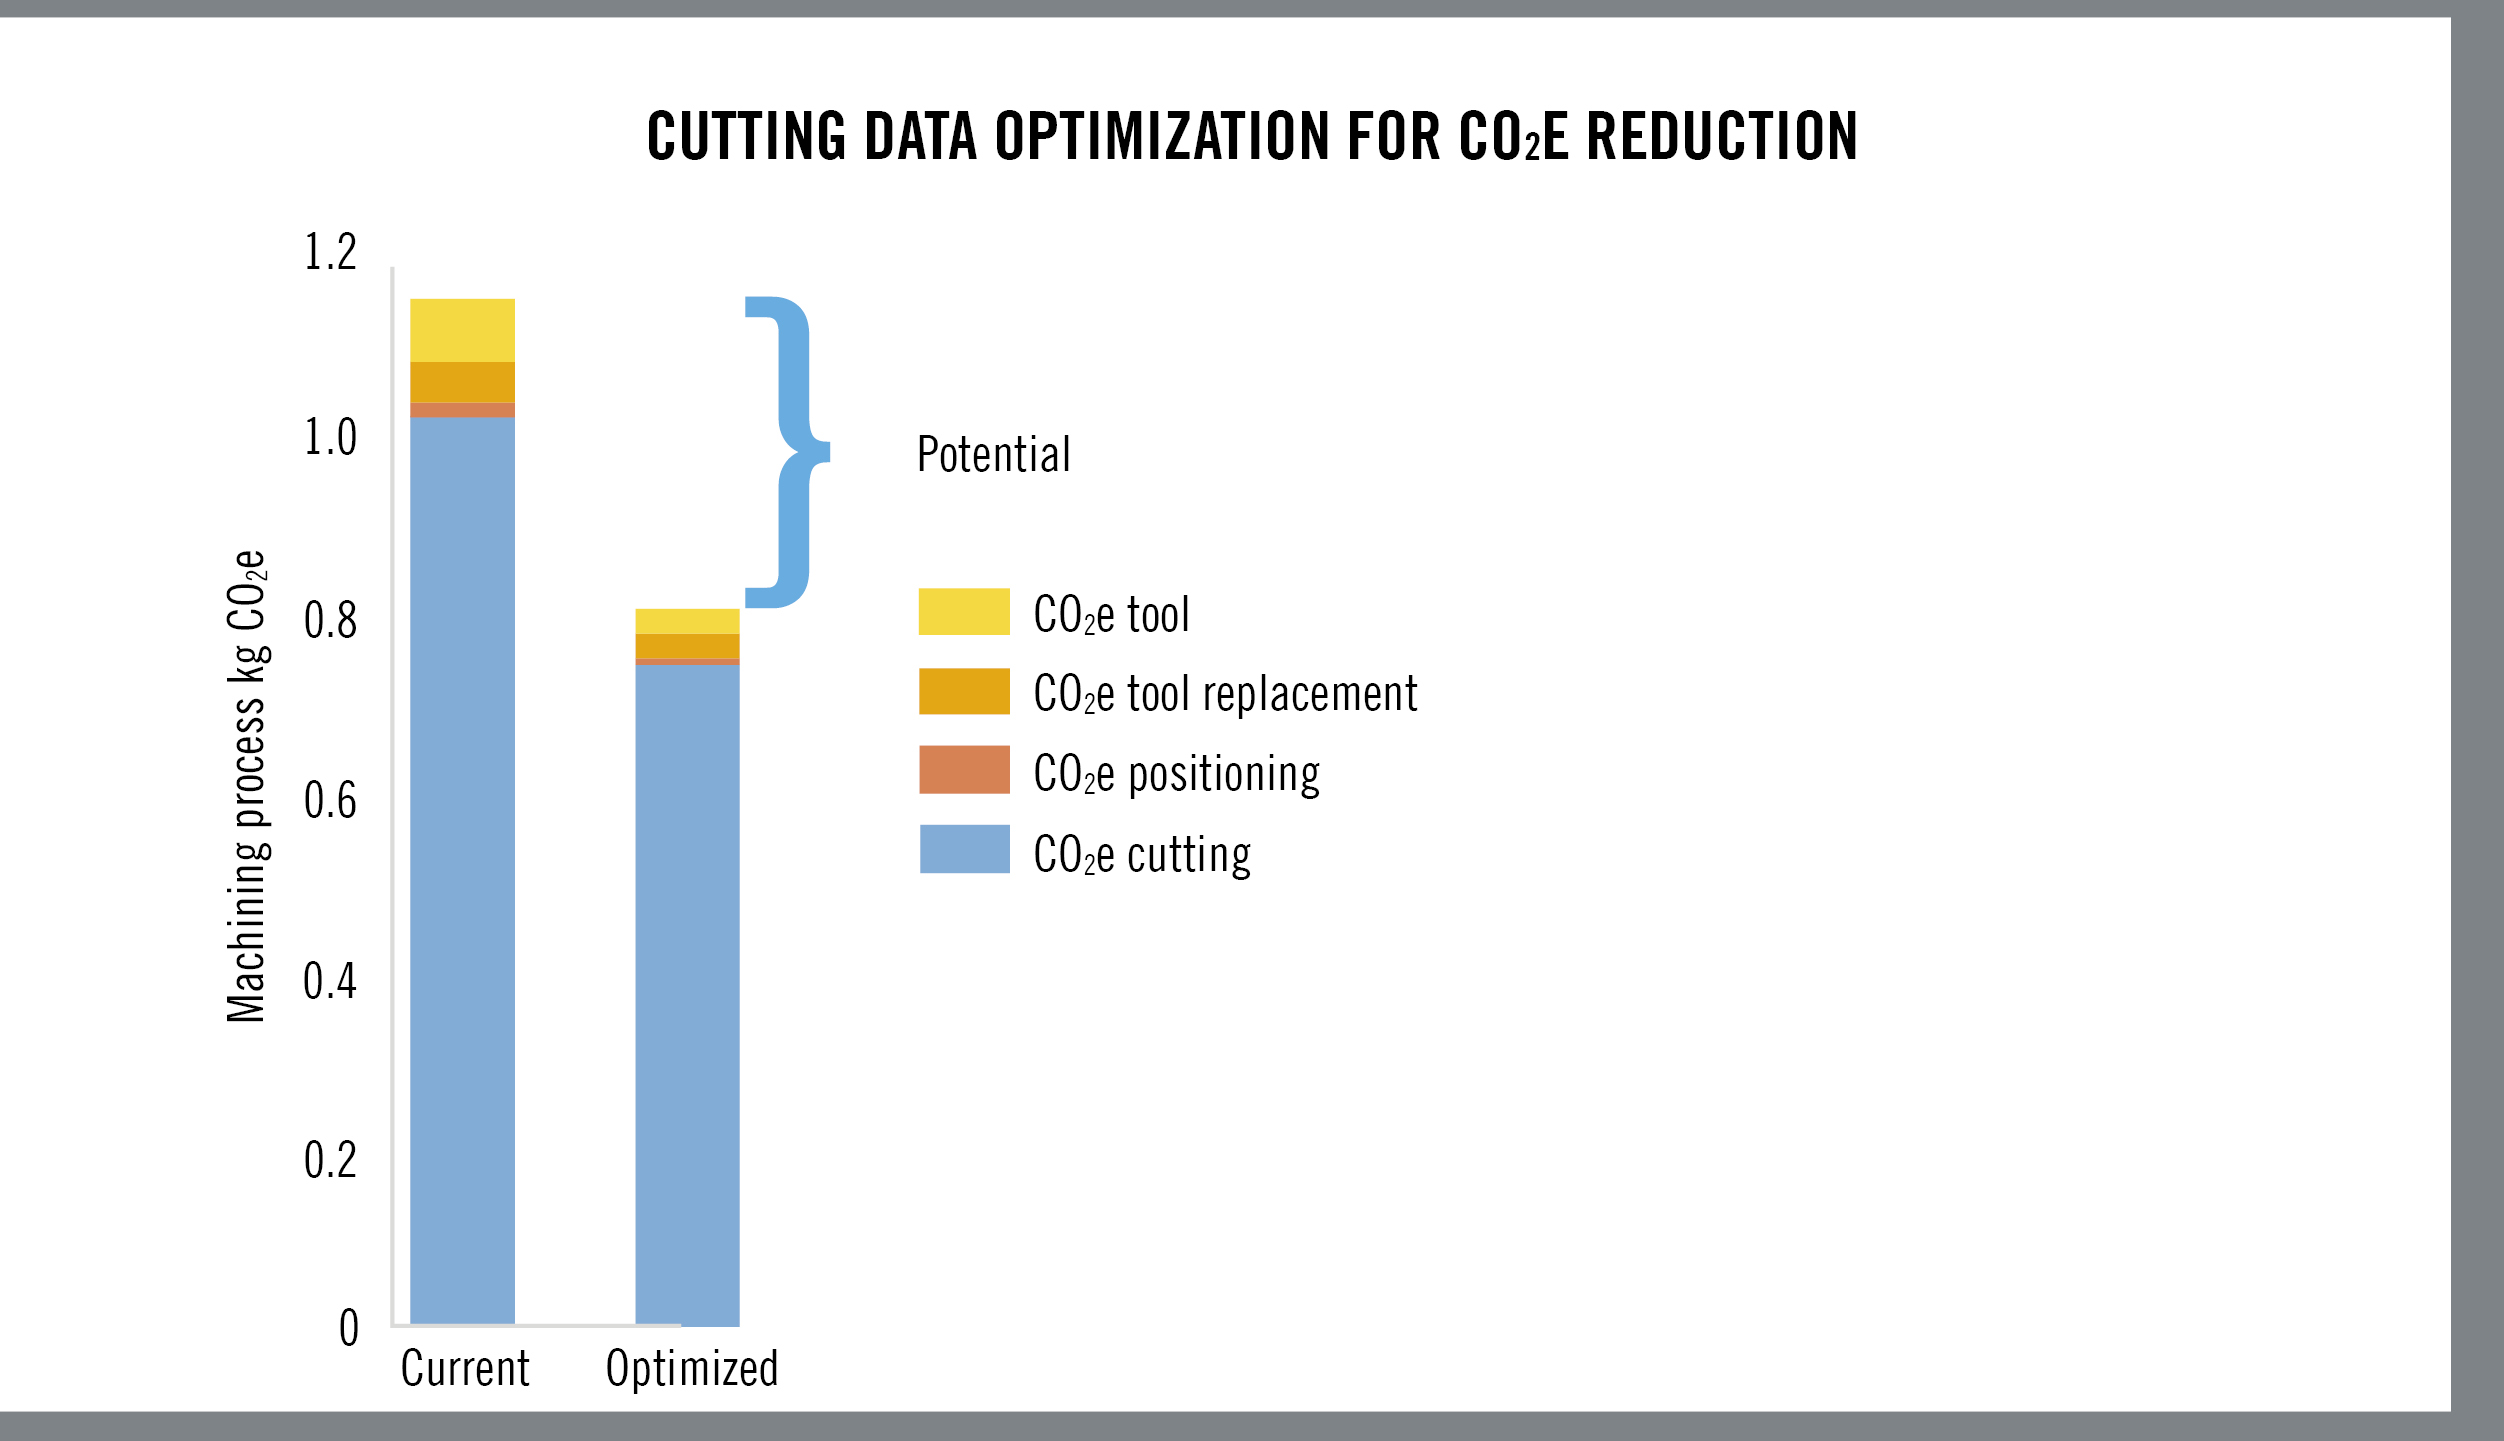 HQ_ILL_Cutting Data Optimization For CO2E Reduction